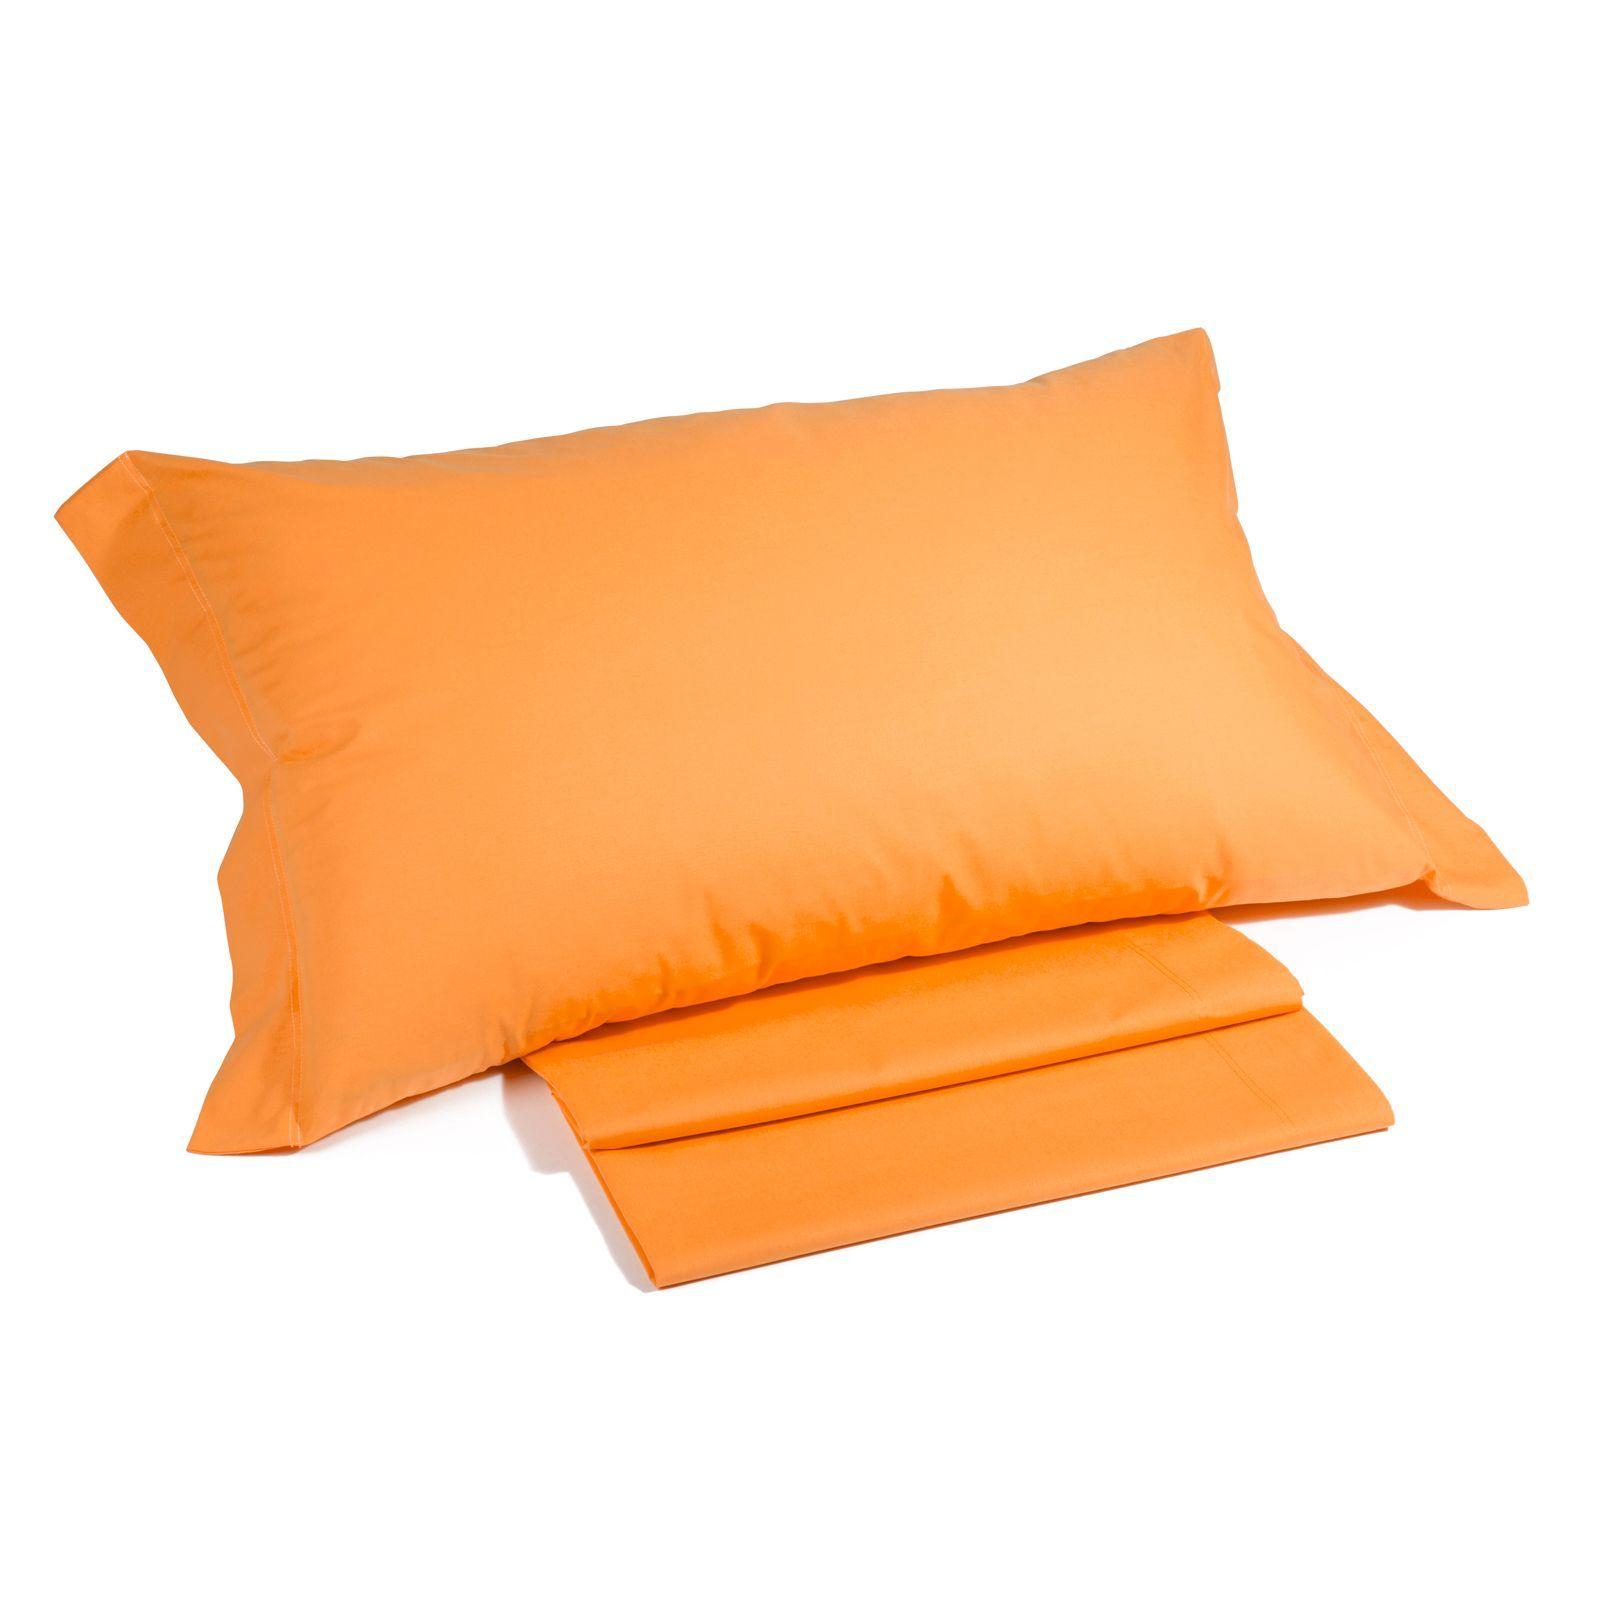 Для сна Наволочки 2шт 52х82 Caleffi Tinta Unita оранжевые komplekt-navolochek-caleffi-tinta-unita-oranzhevyy-italiya.jpg